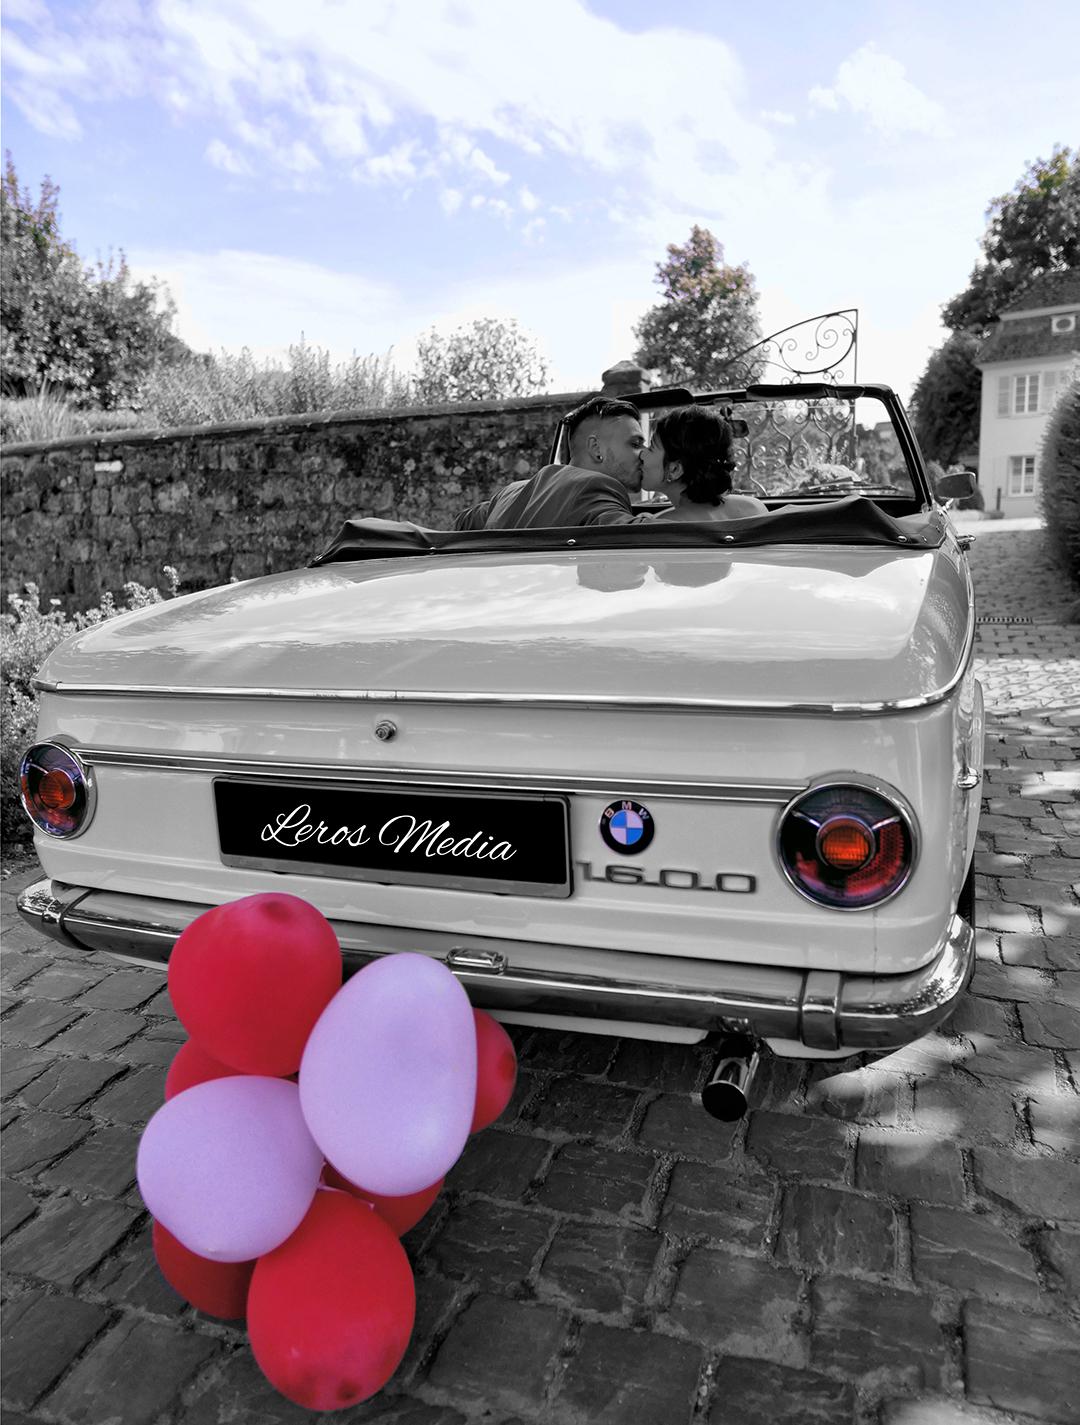 Brautpaar Auto Leros Media